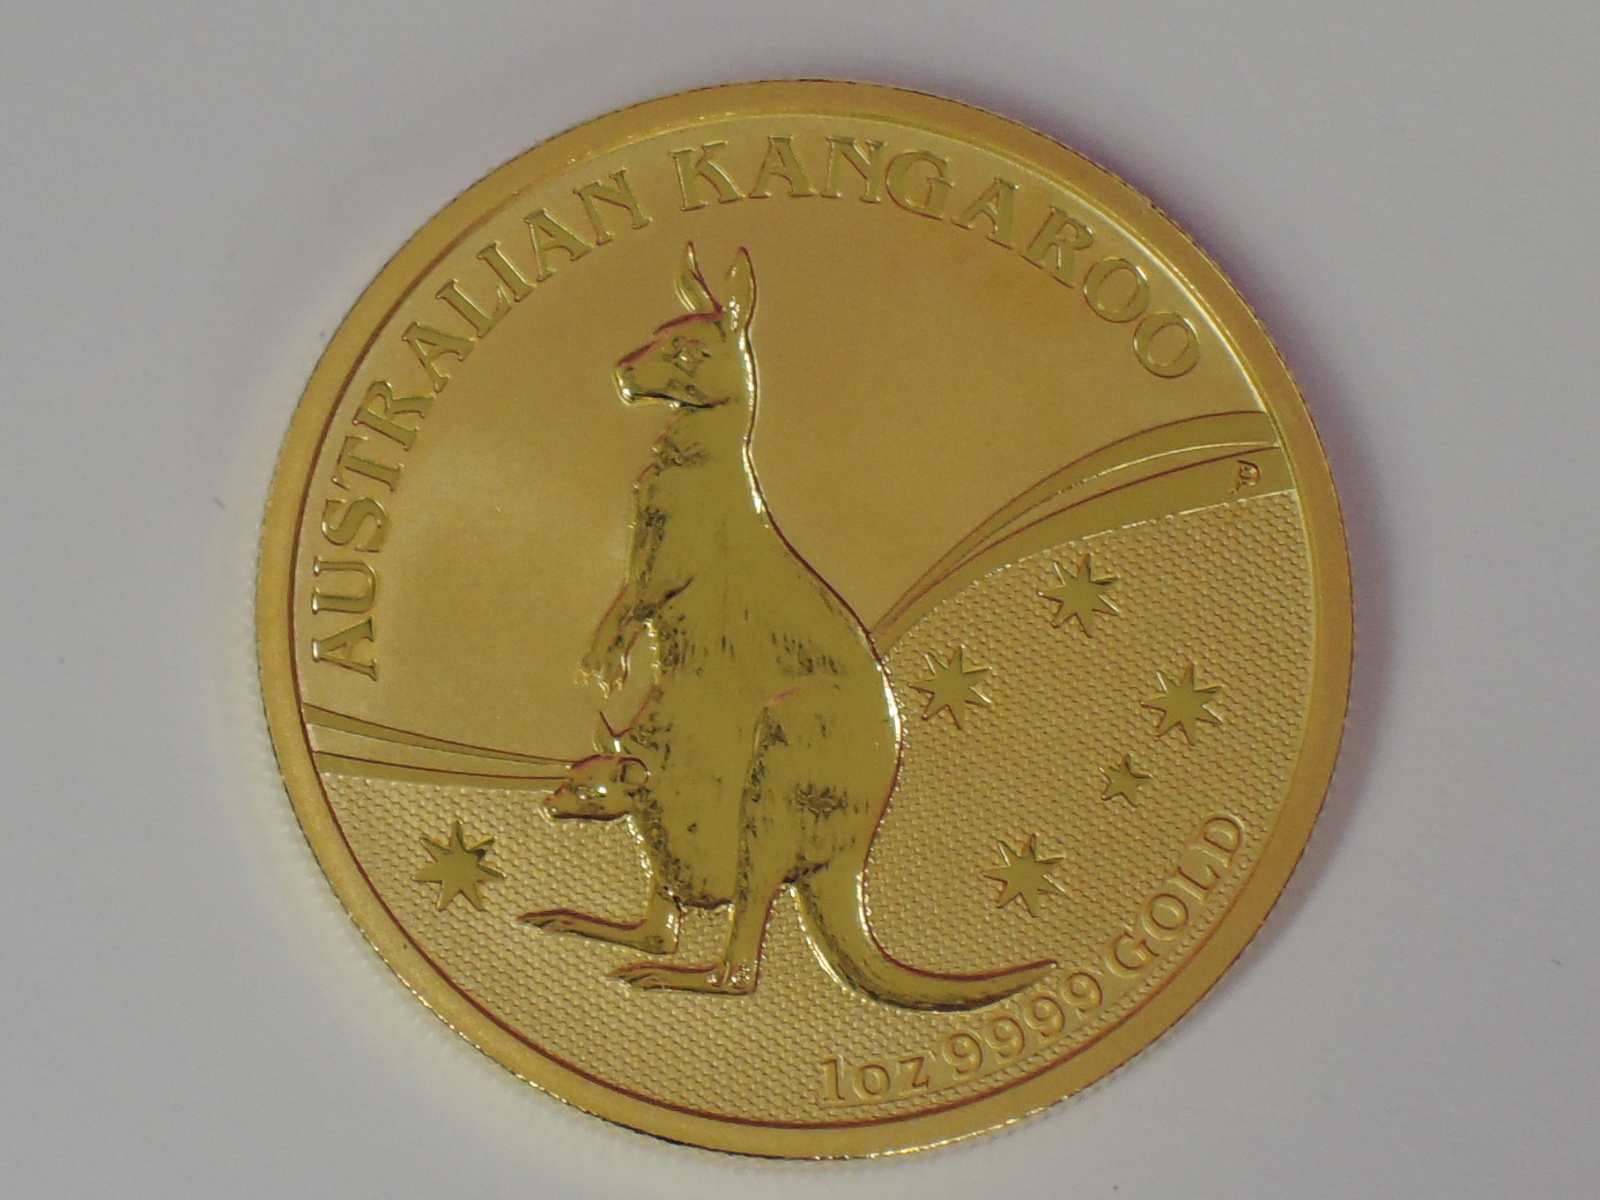 Lot 602 - A gold 1oz 2009 100 dollar Australian Kangaroo coin, in plastic case